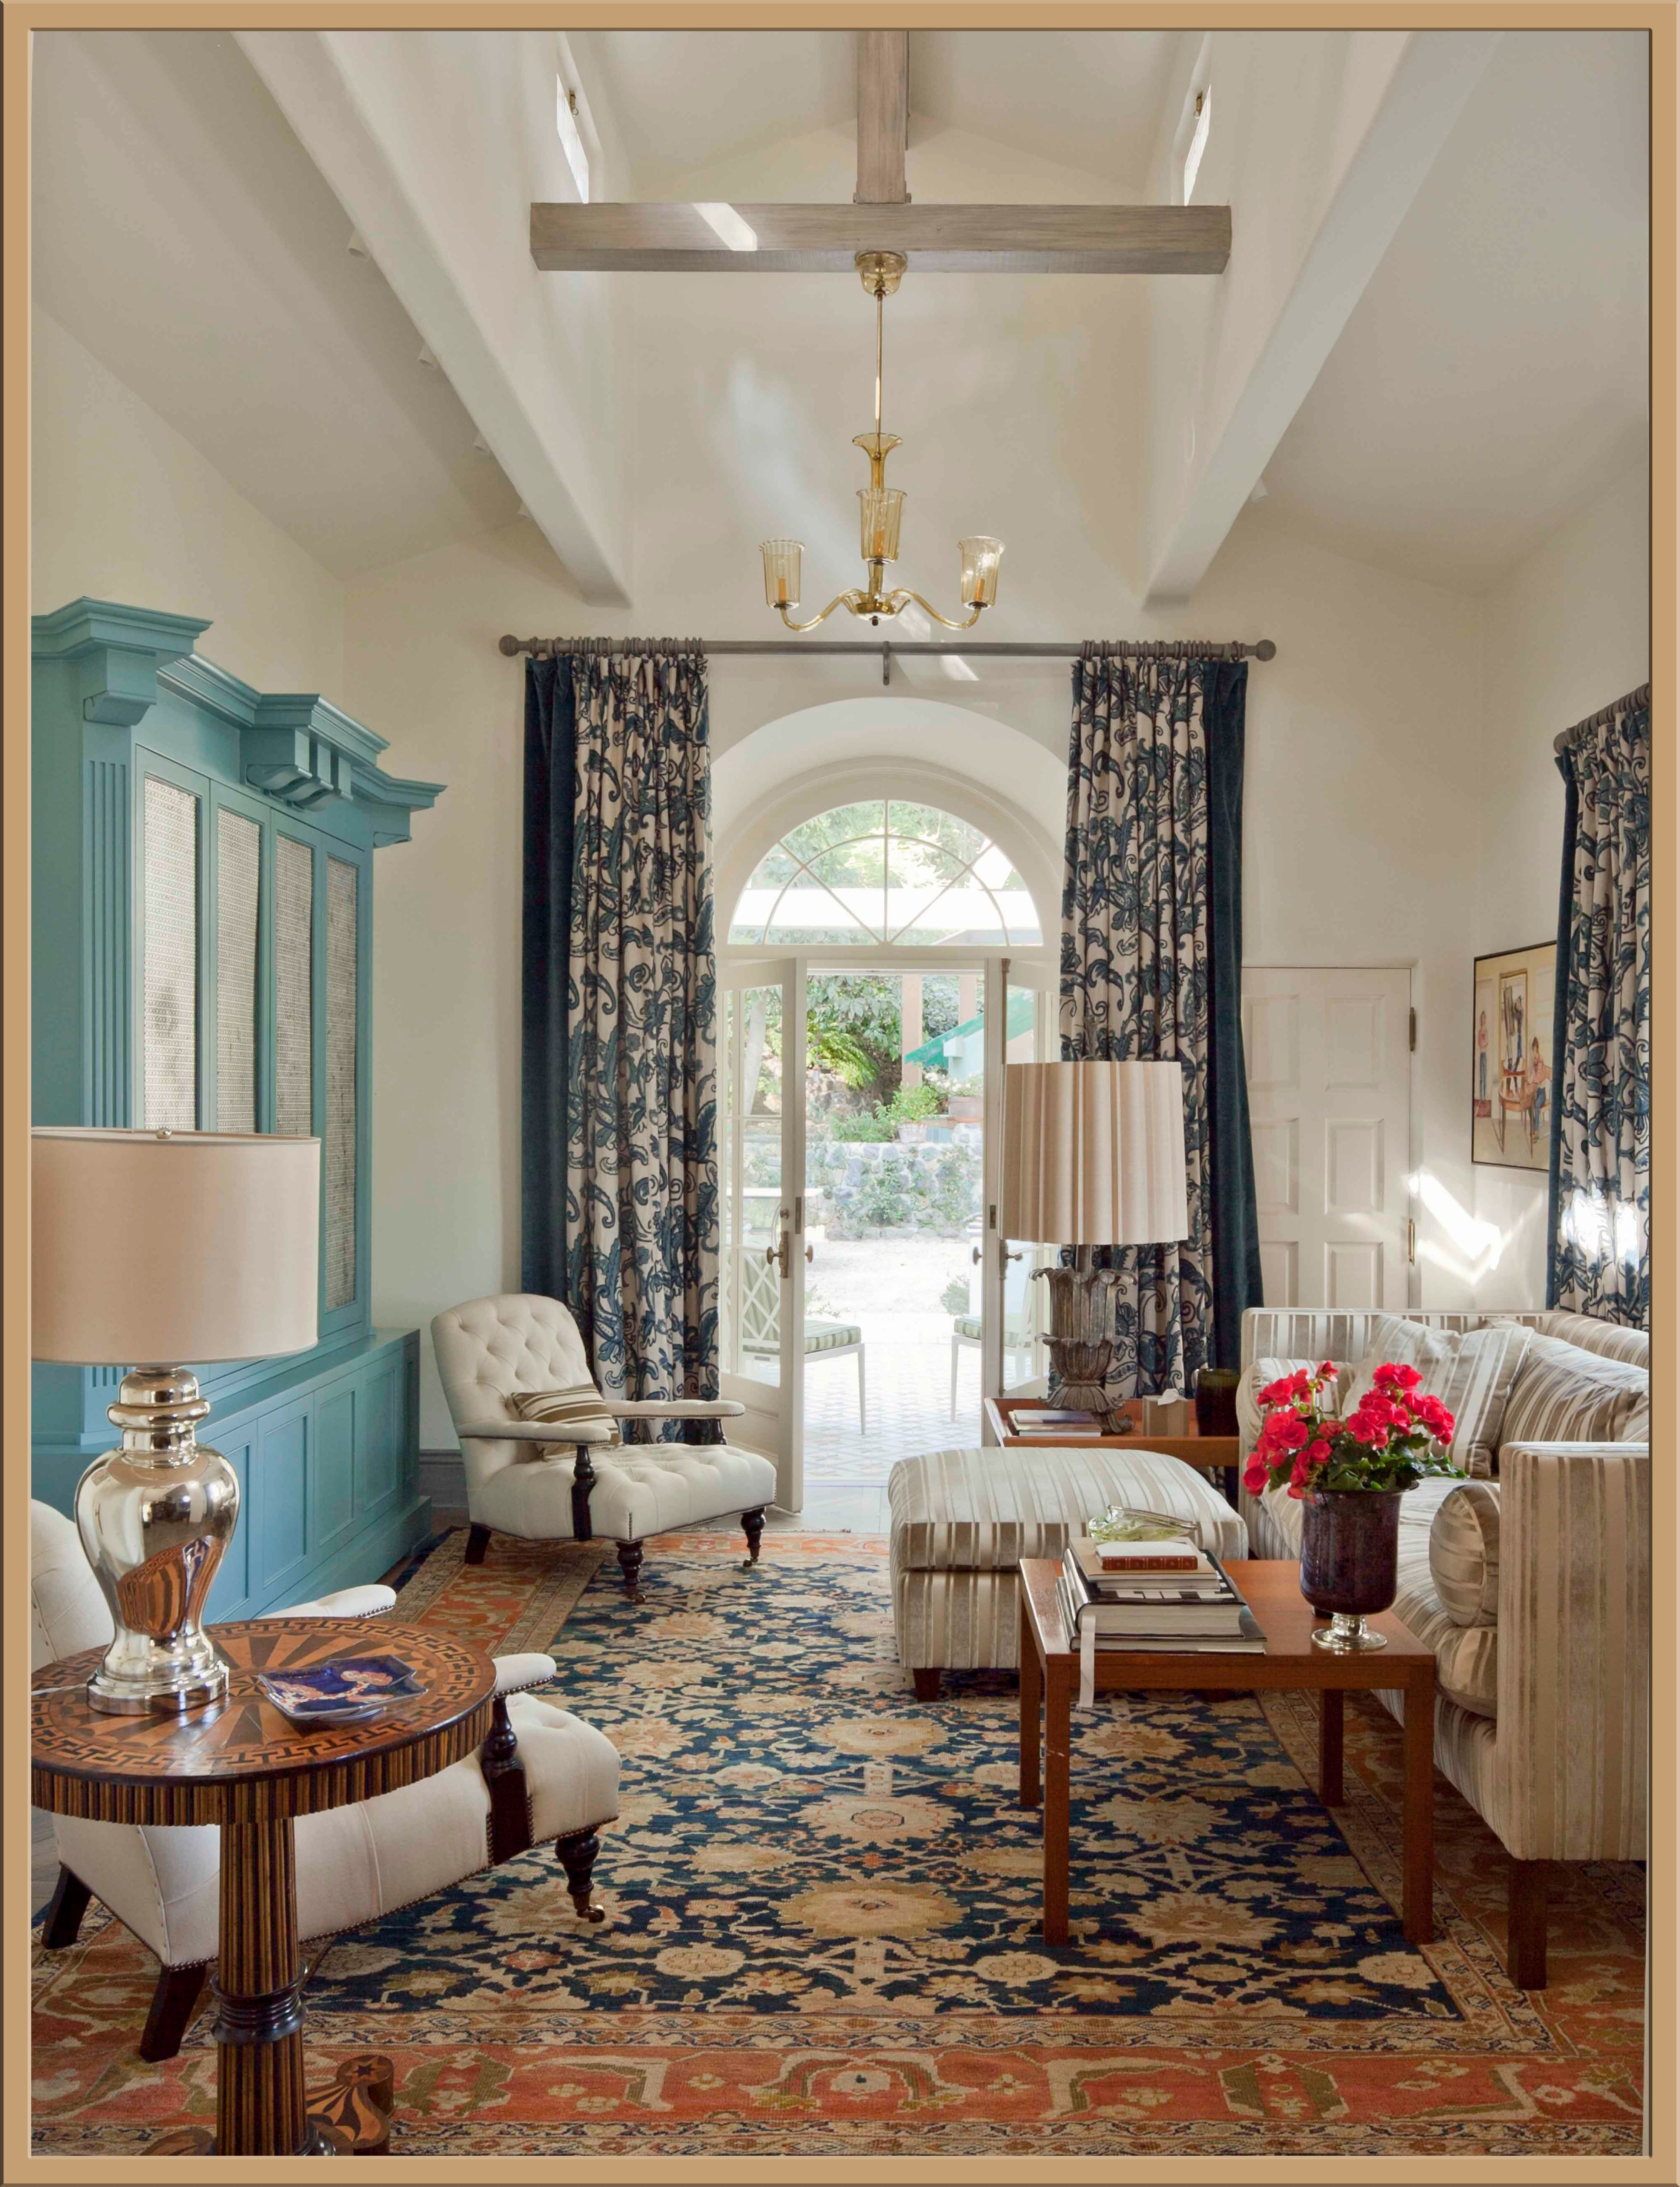 Top 5 Books About Interior Design